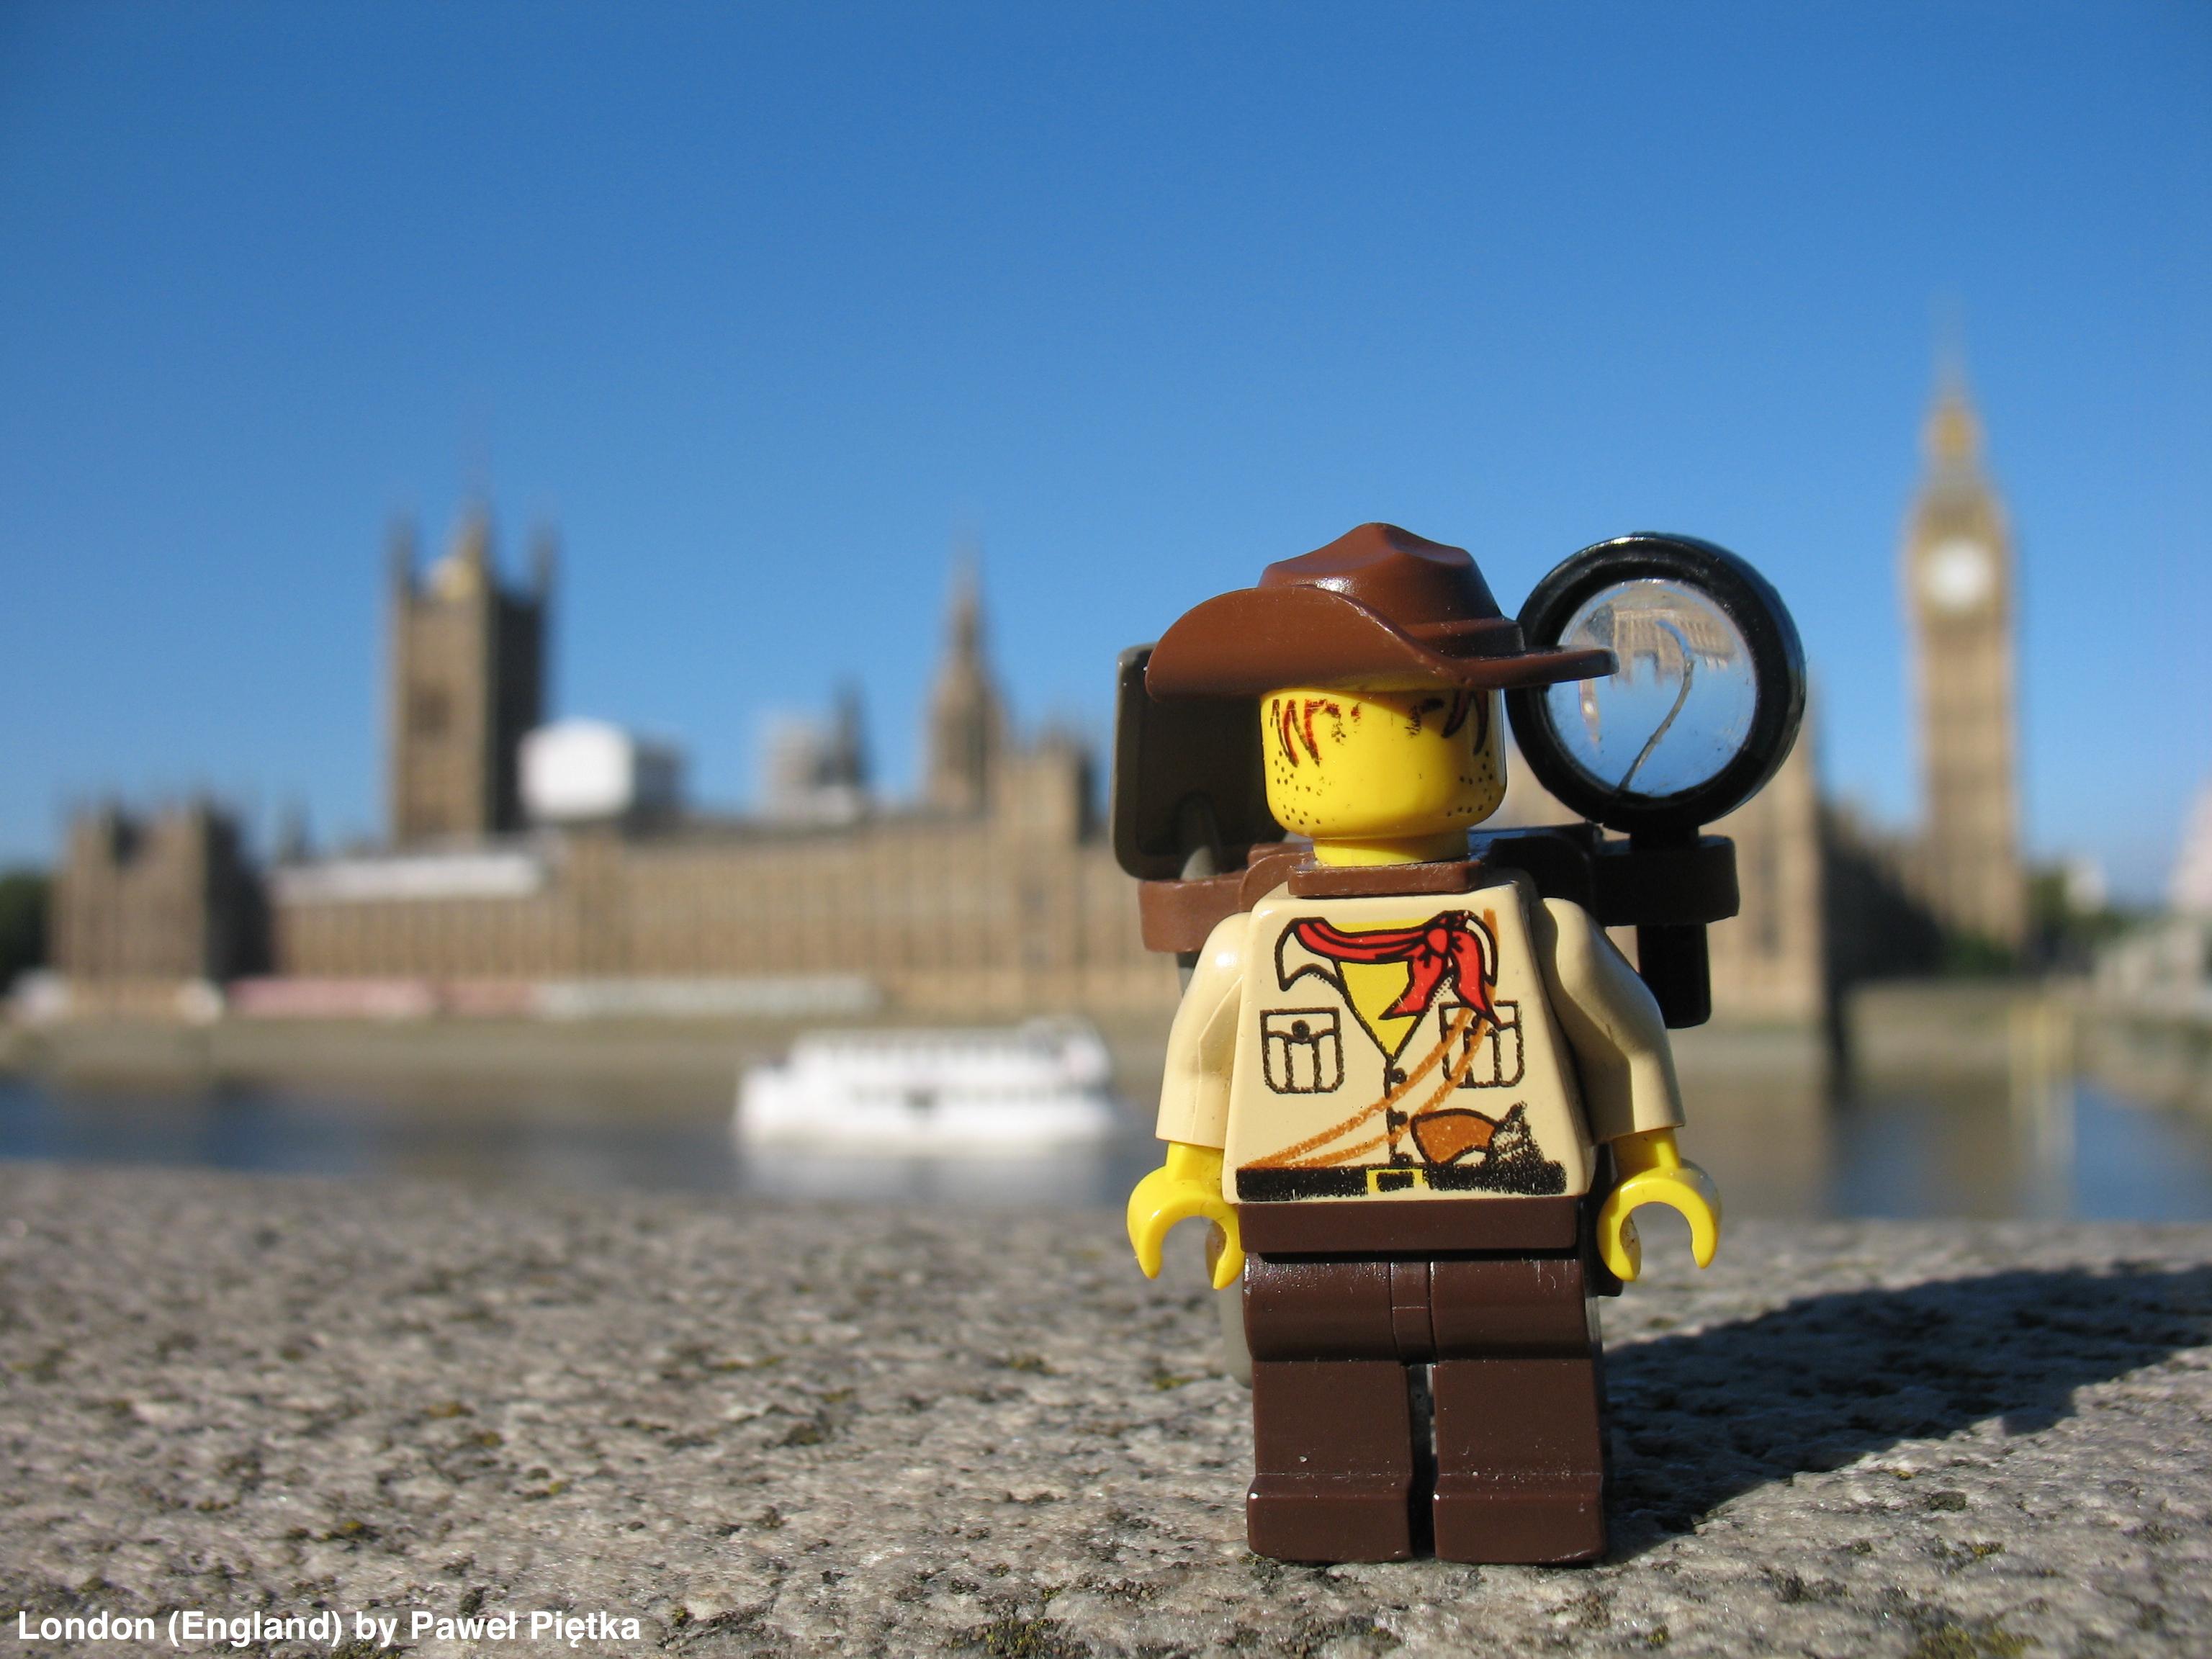 London (England) - Palace of Westminster Big Ben